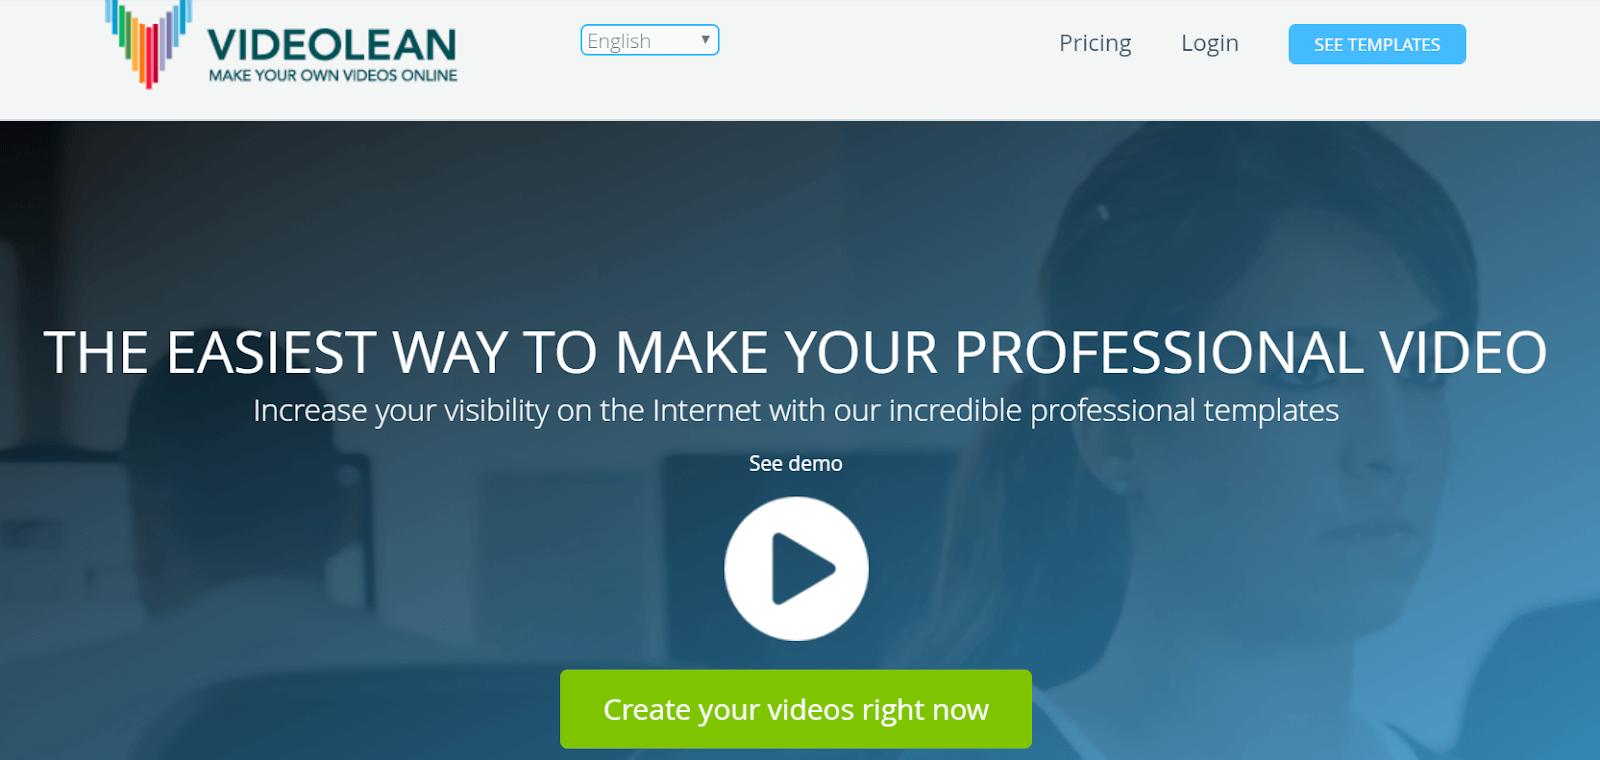 Videolean Video Marketing Tool